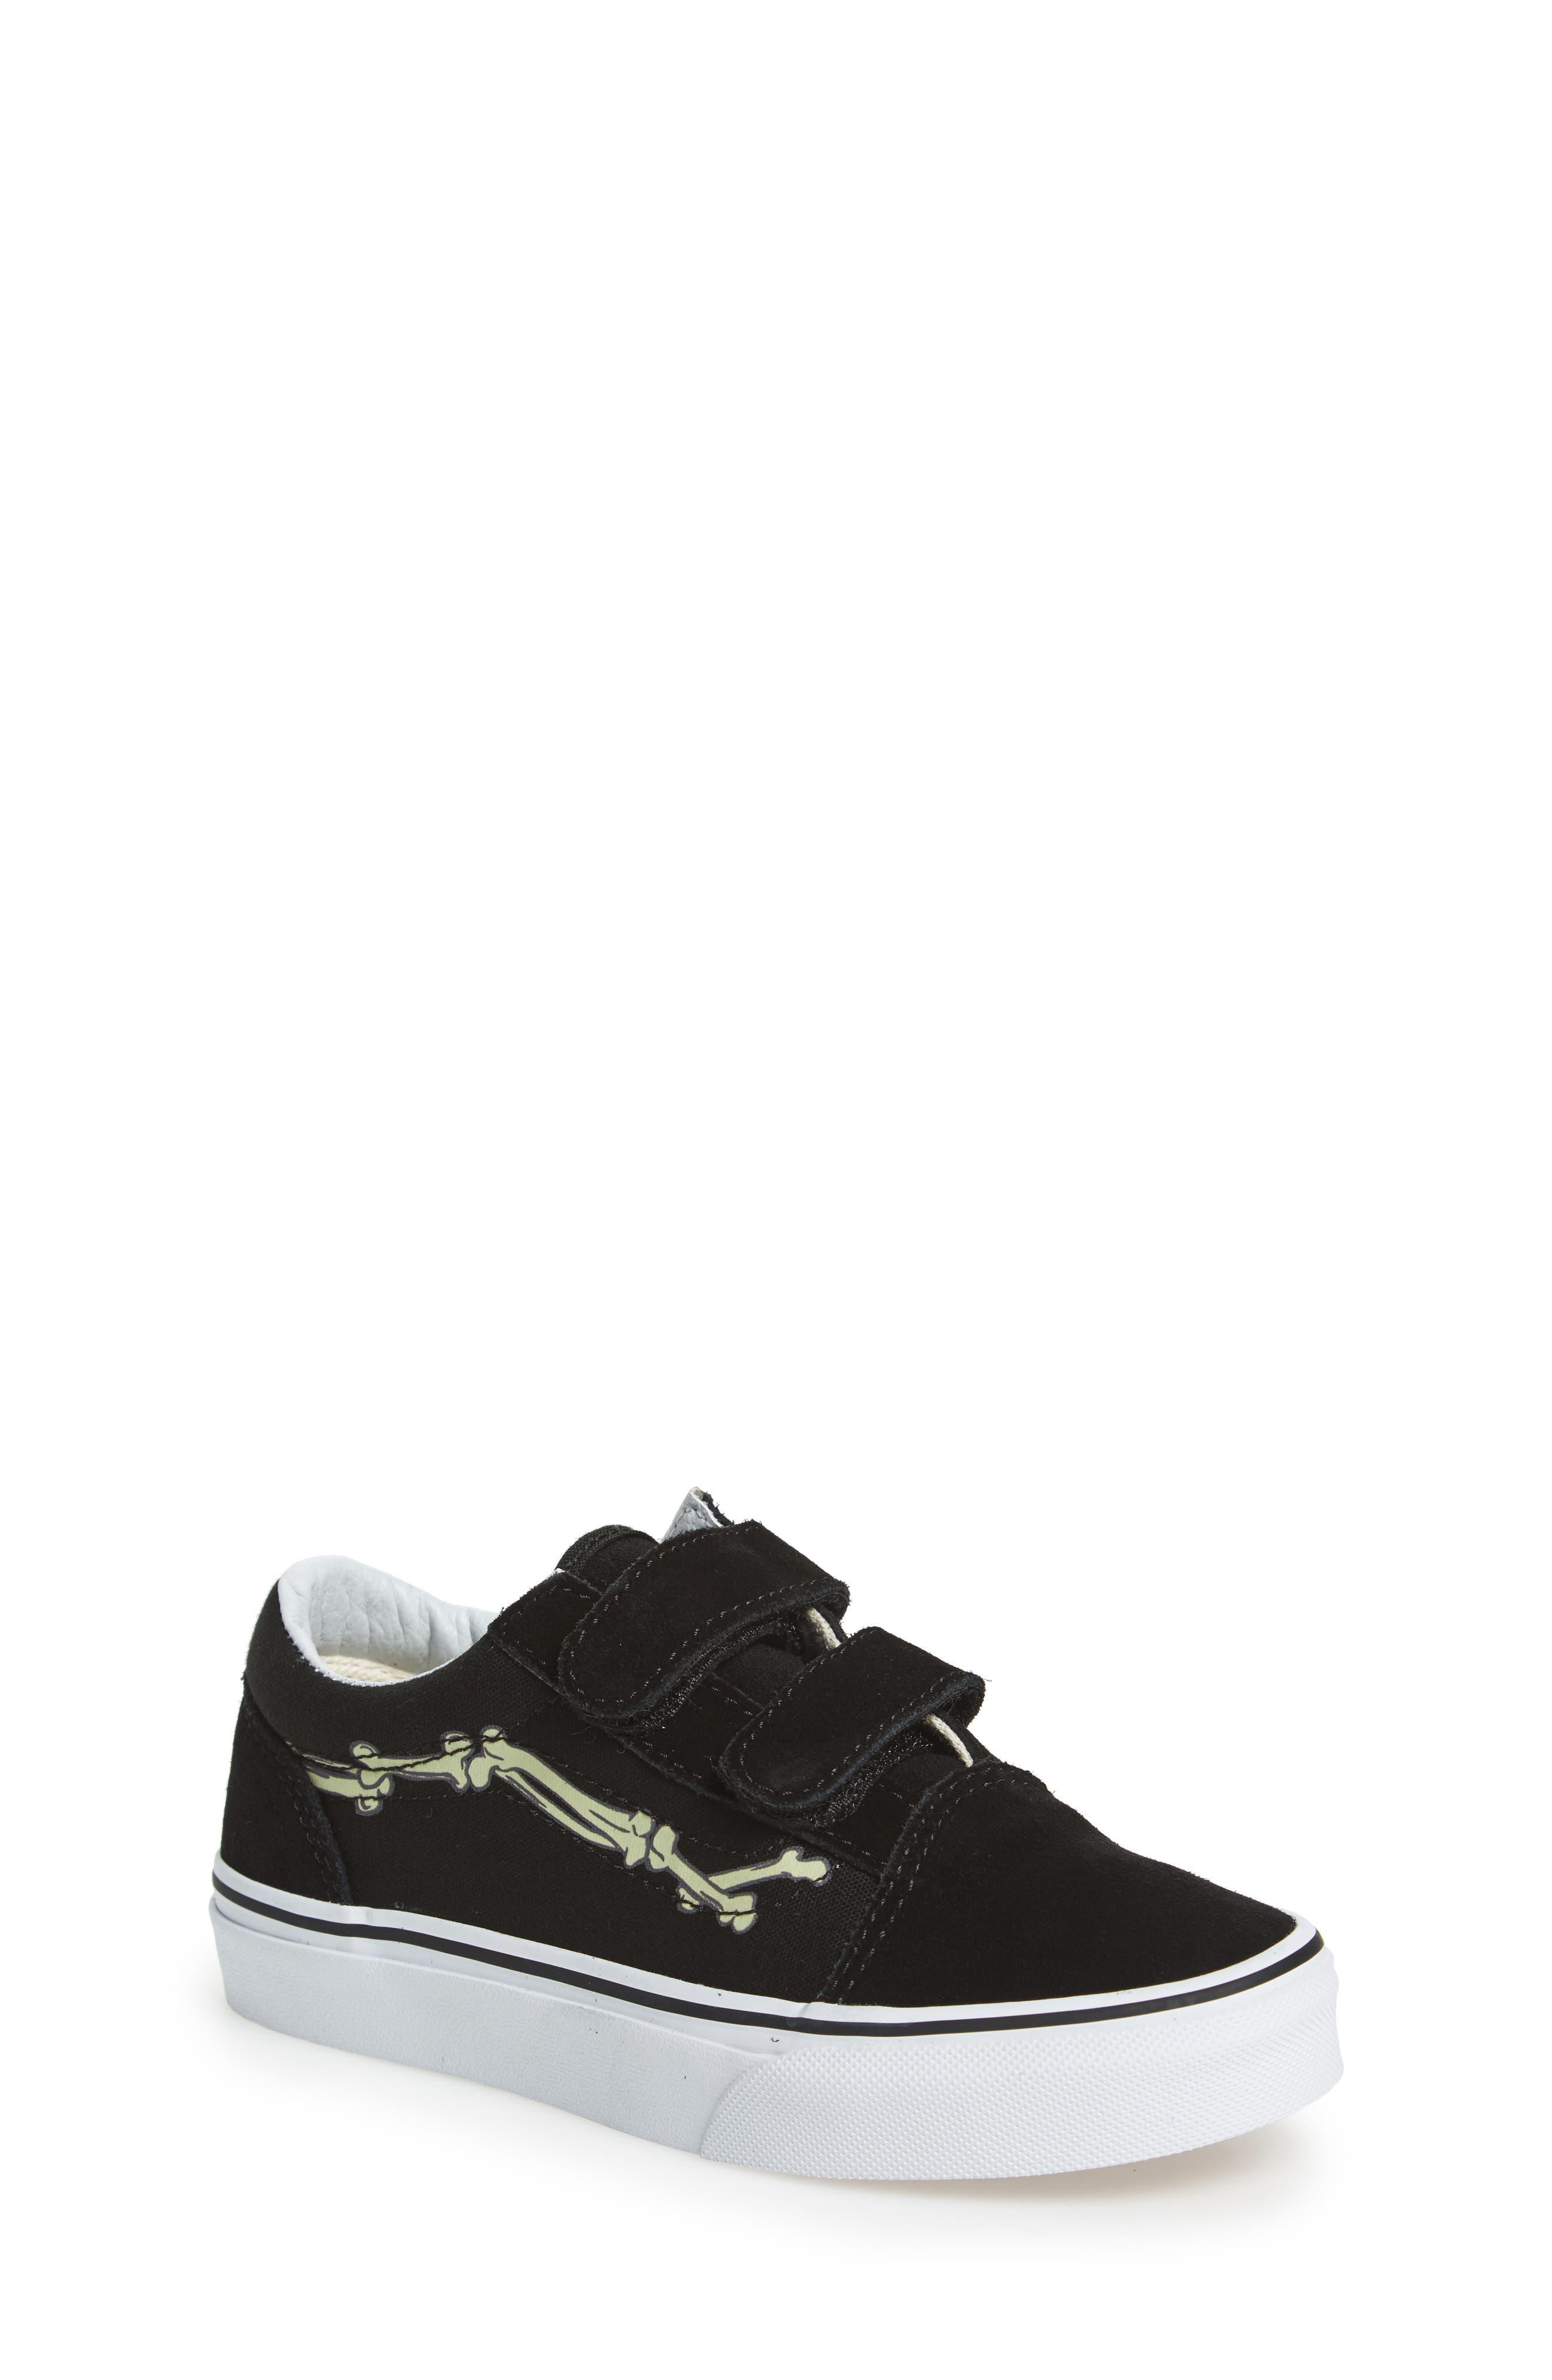 Old Skool Skate Sneaker,                             Main thumbnail 1, color,                             001